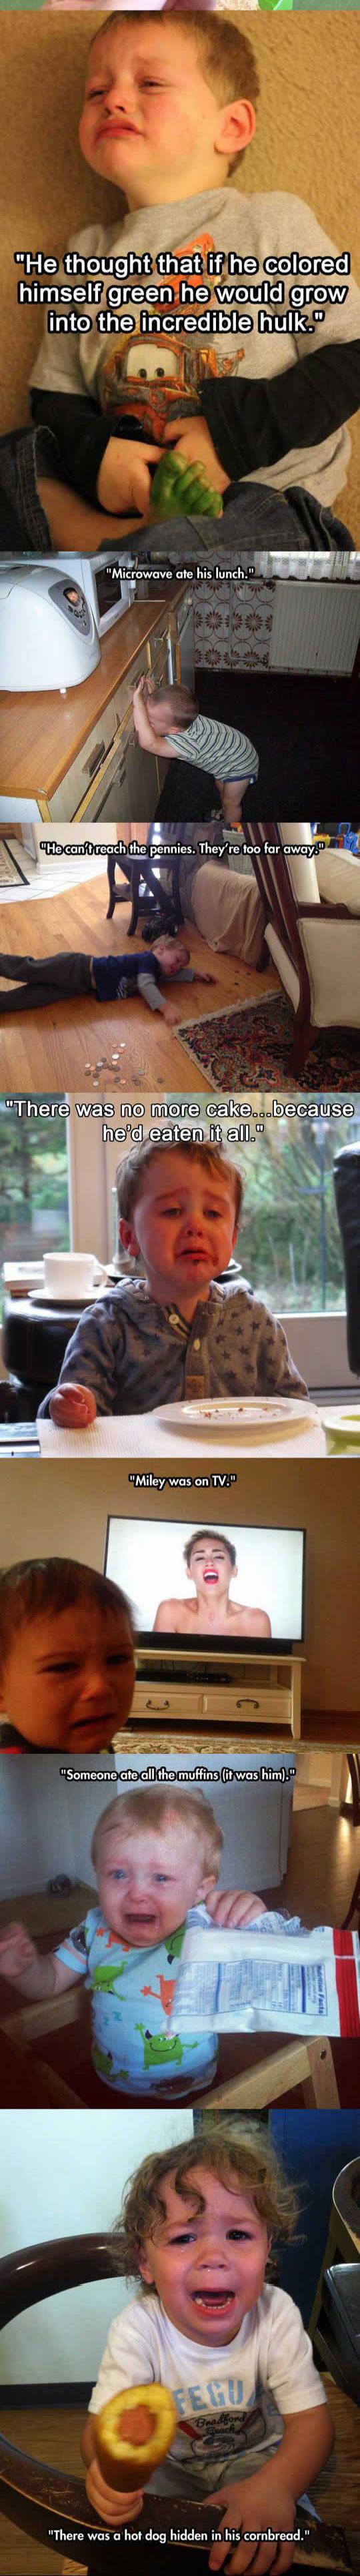 funny-toddlers-crying-no-reason-eating